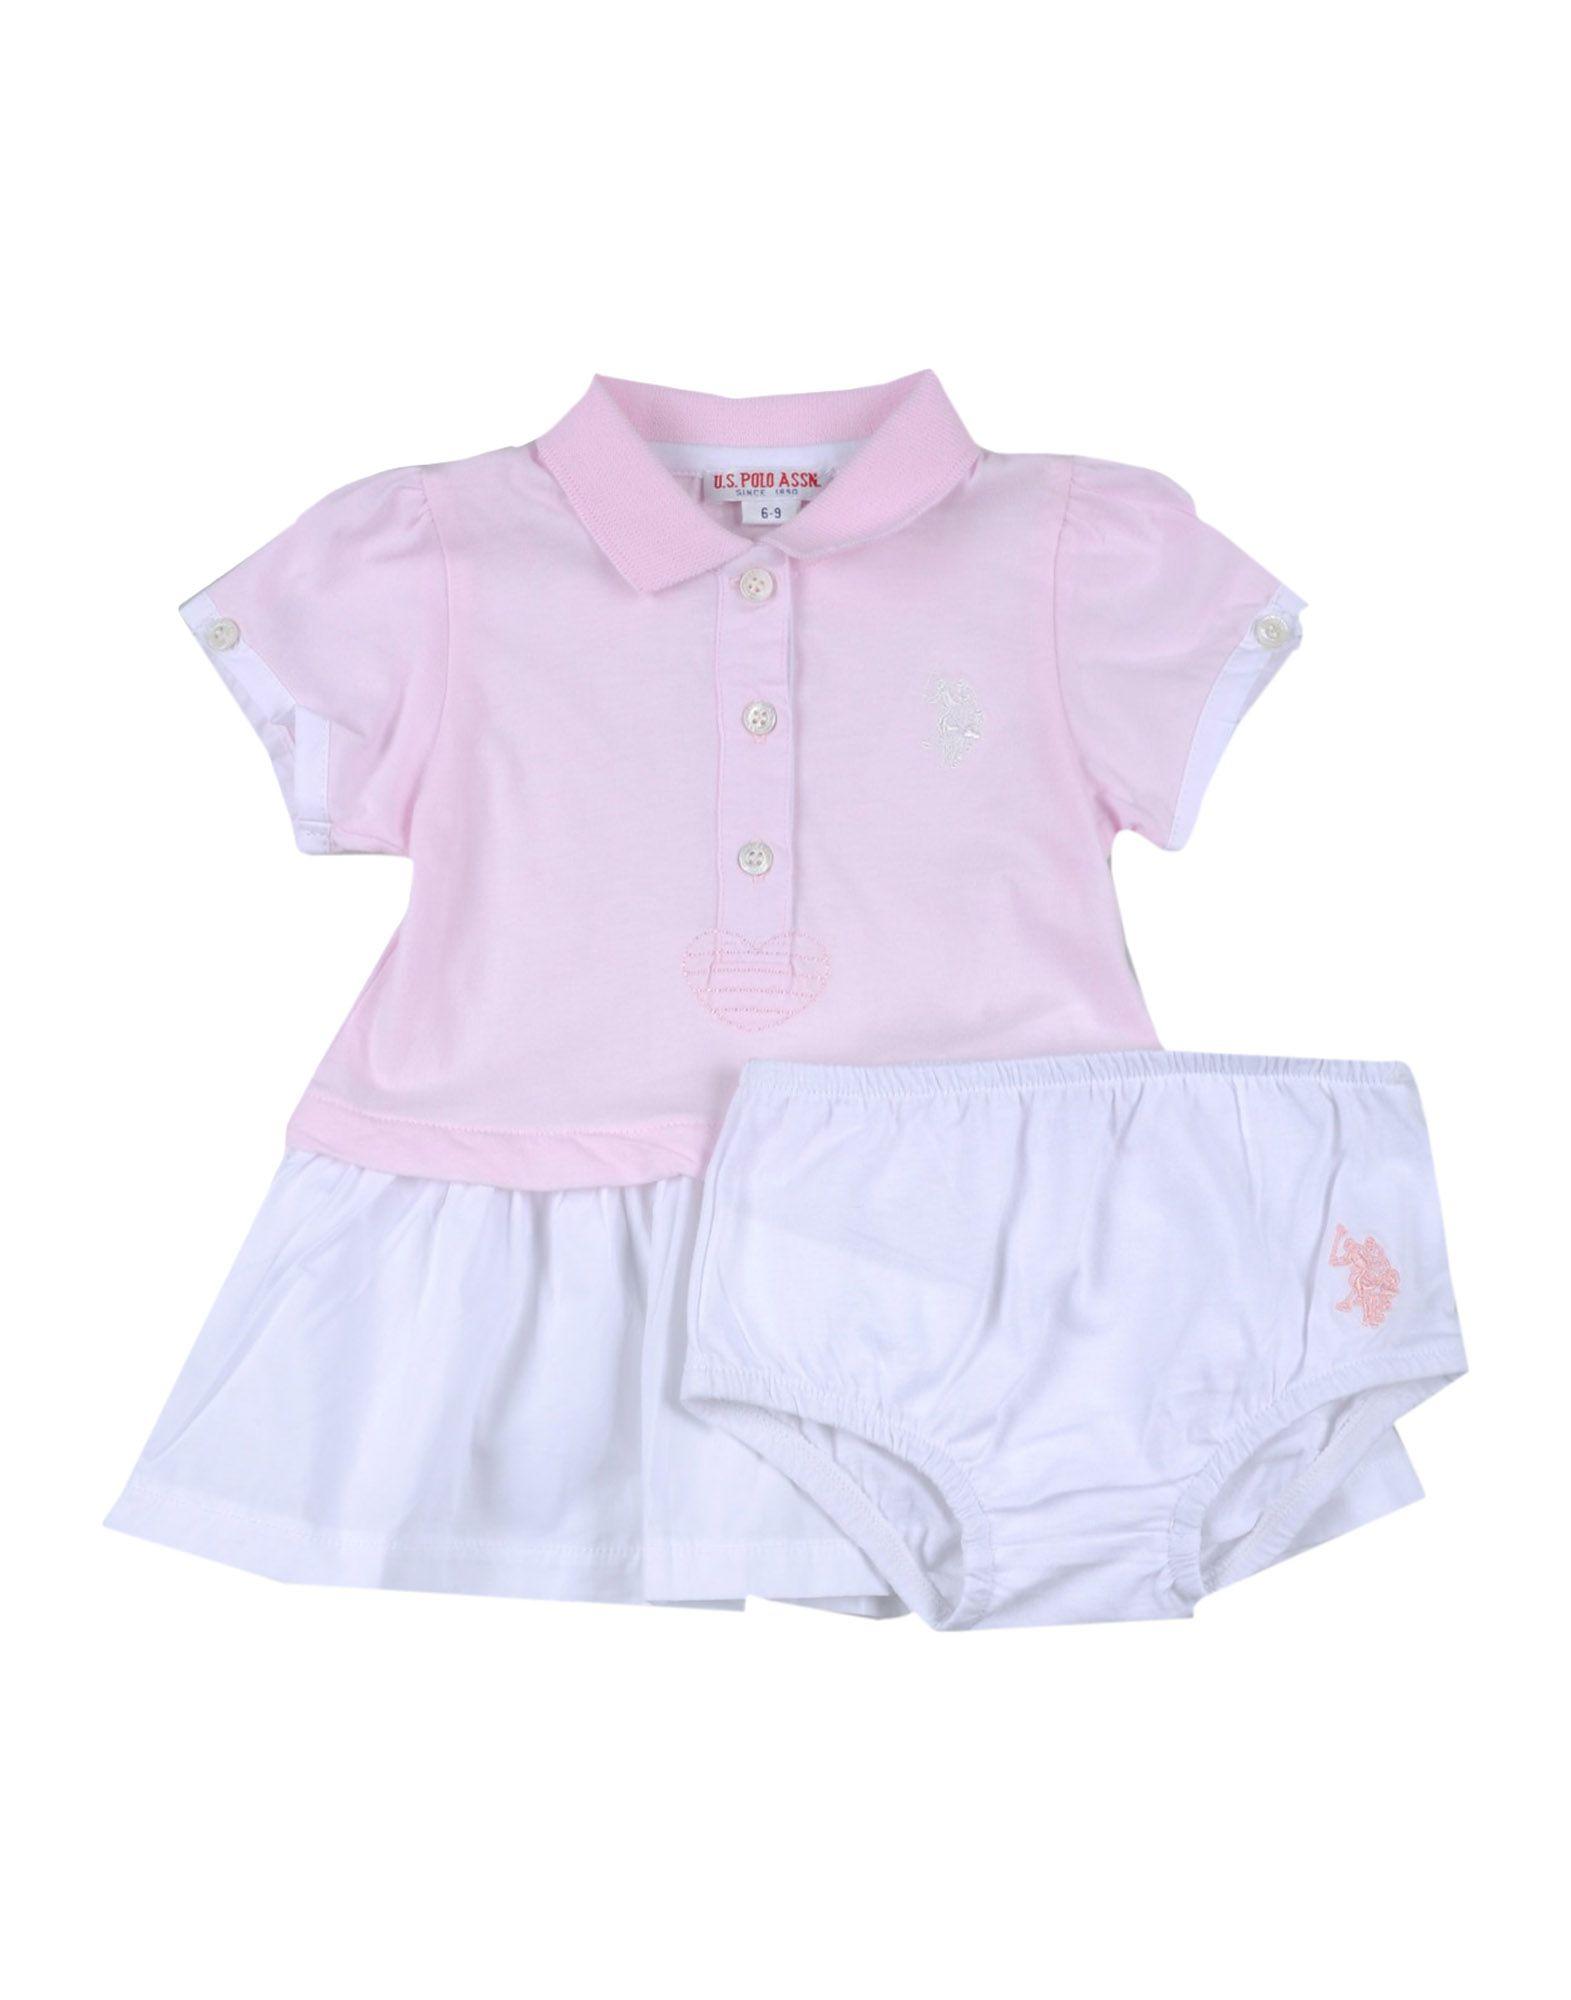 U.S.POLO ASSN. Mädchen 0-24 monate Kleid Farbe Rosa Größe 4